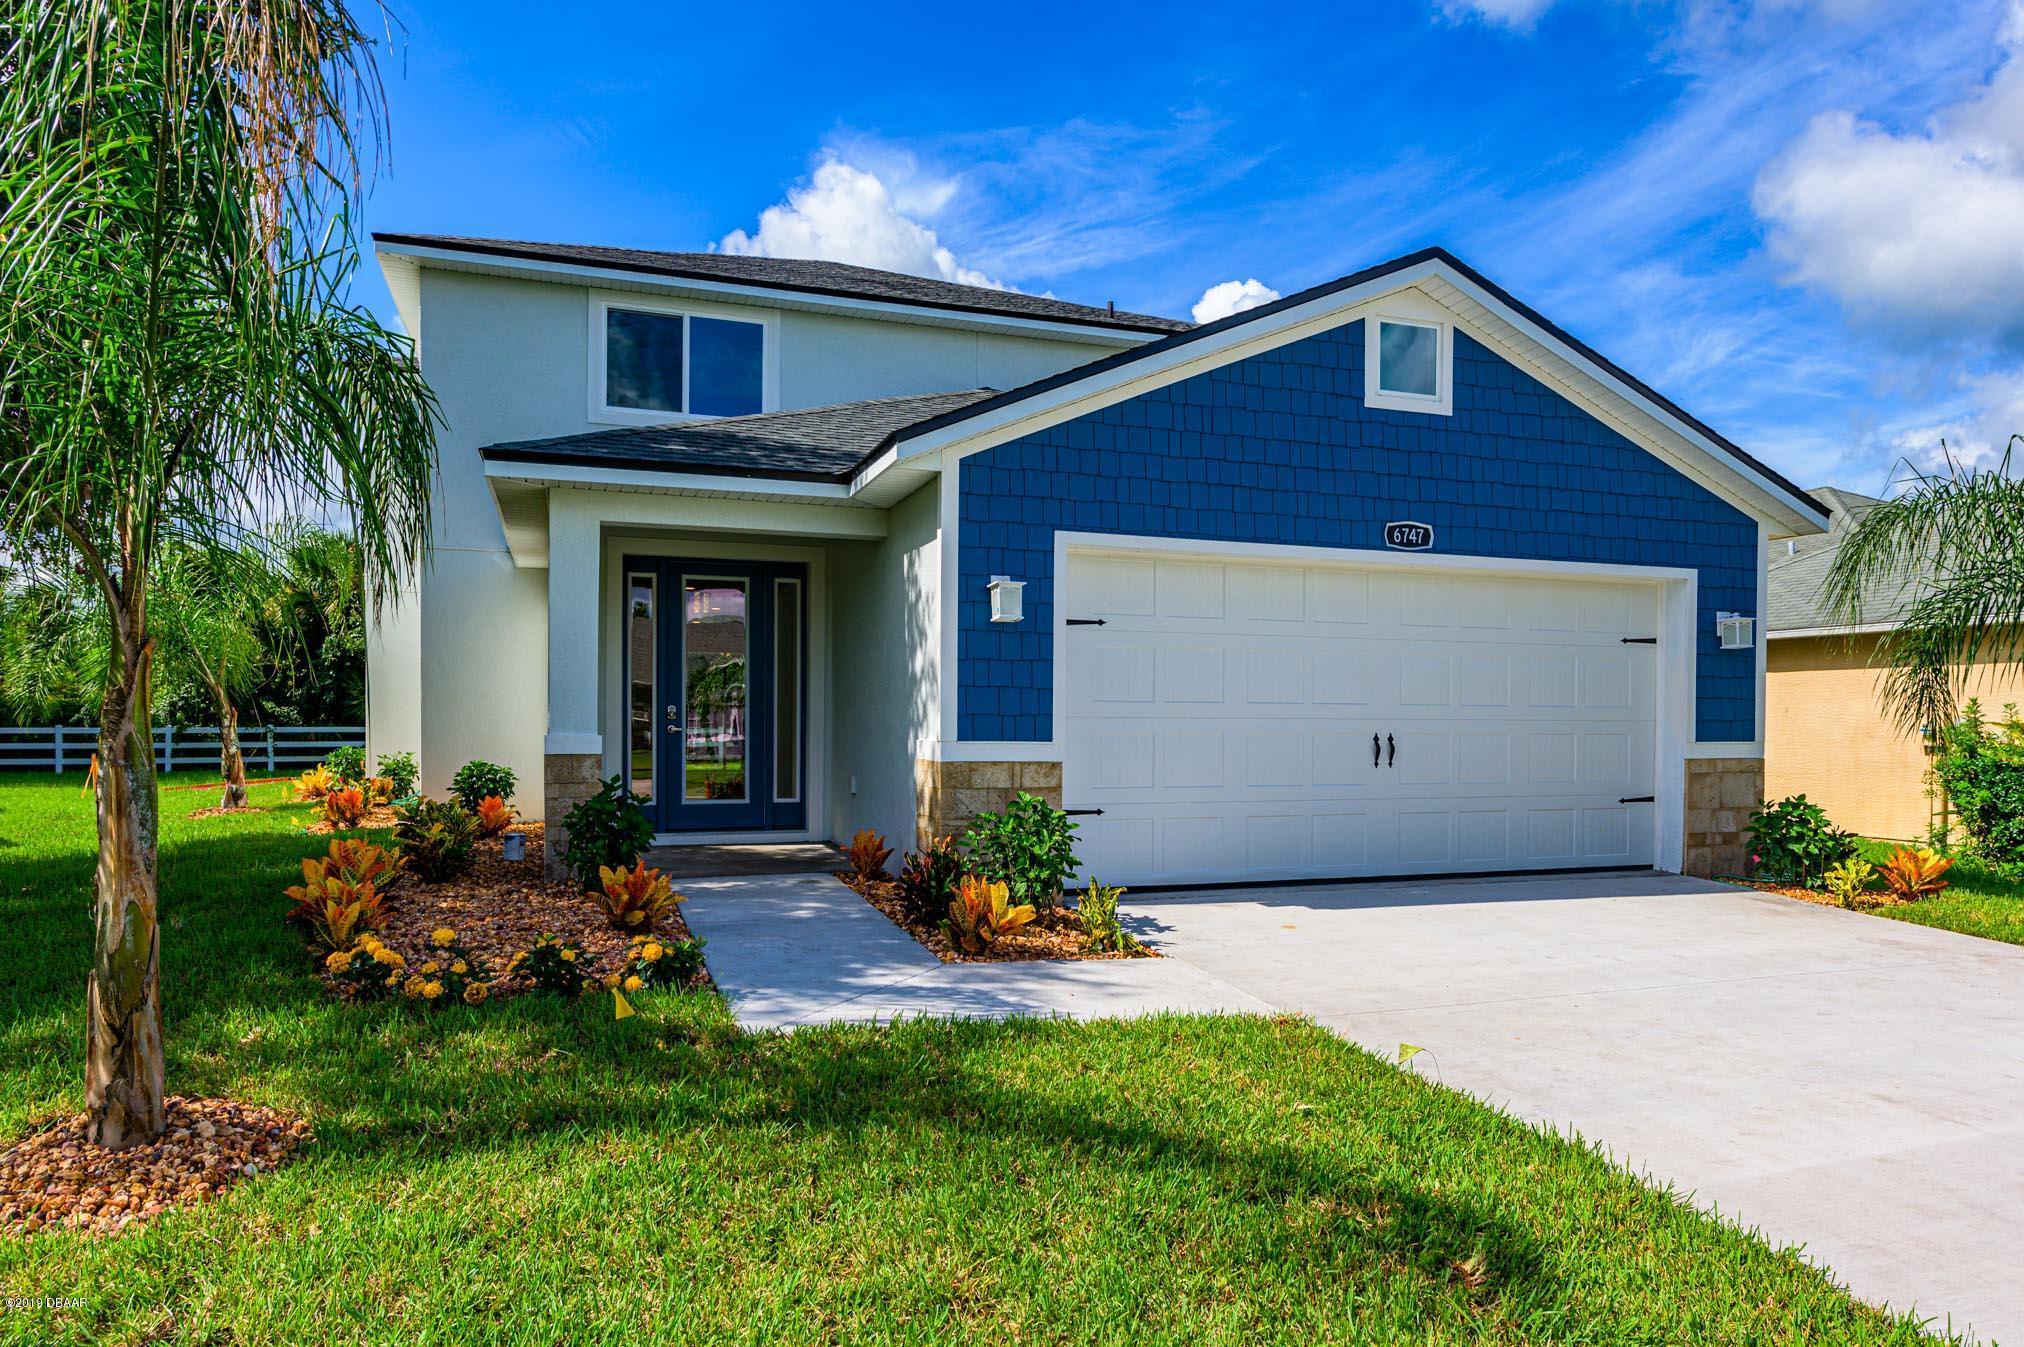 Photo of 6747 Calistoga Circle, Port Orange, FL 32128